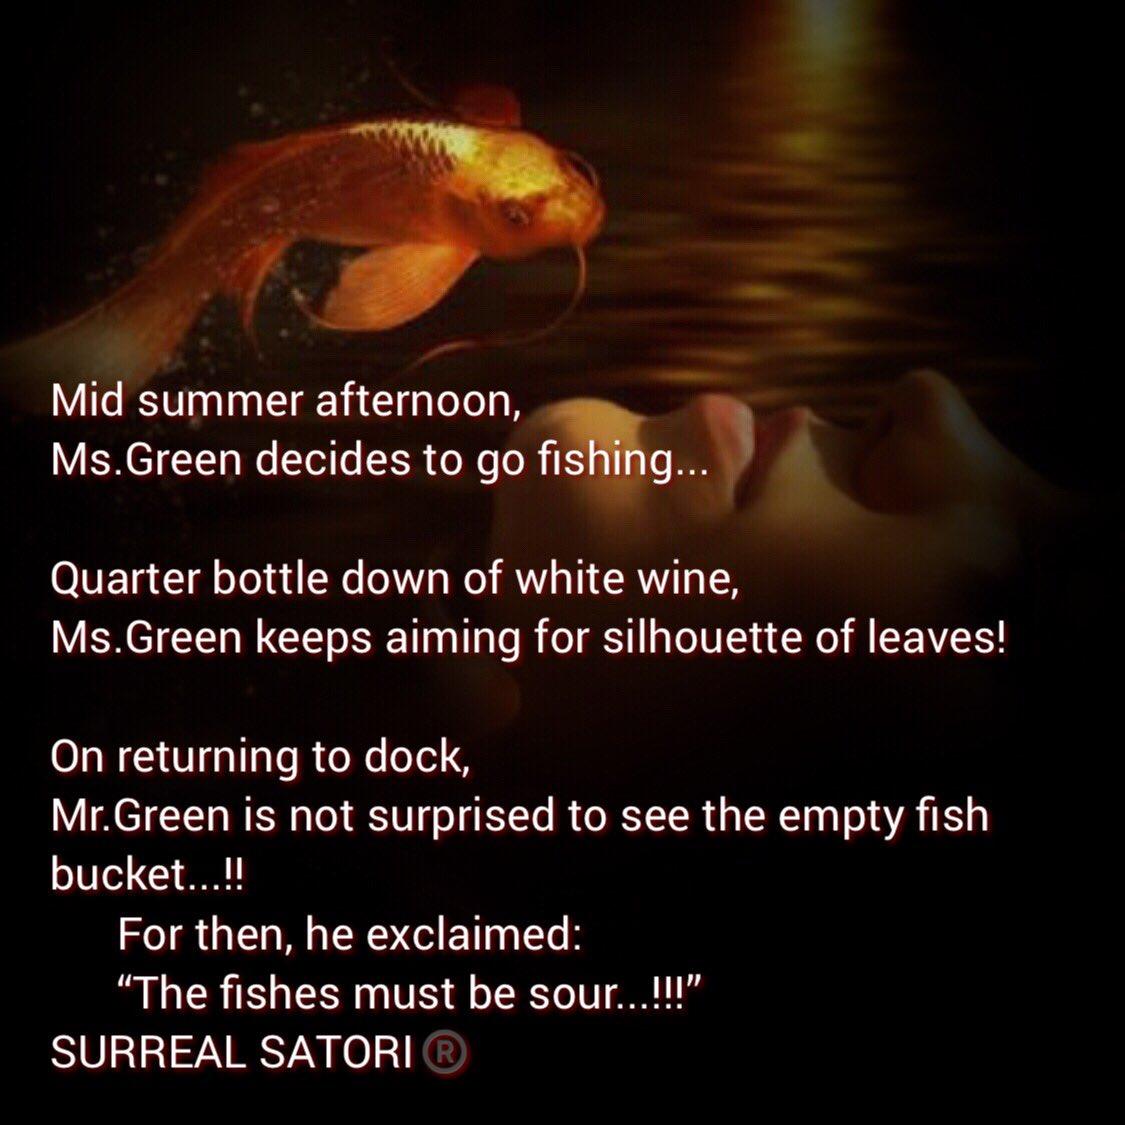 Surreal Satori On Twitter Poetrybooks Poems Storytime